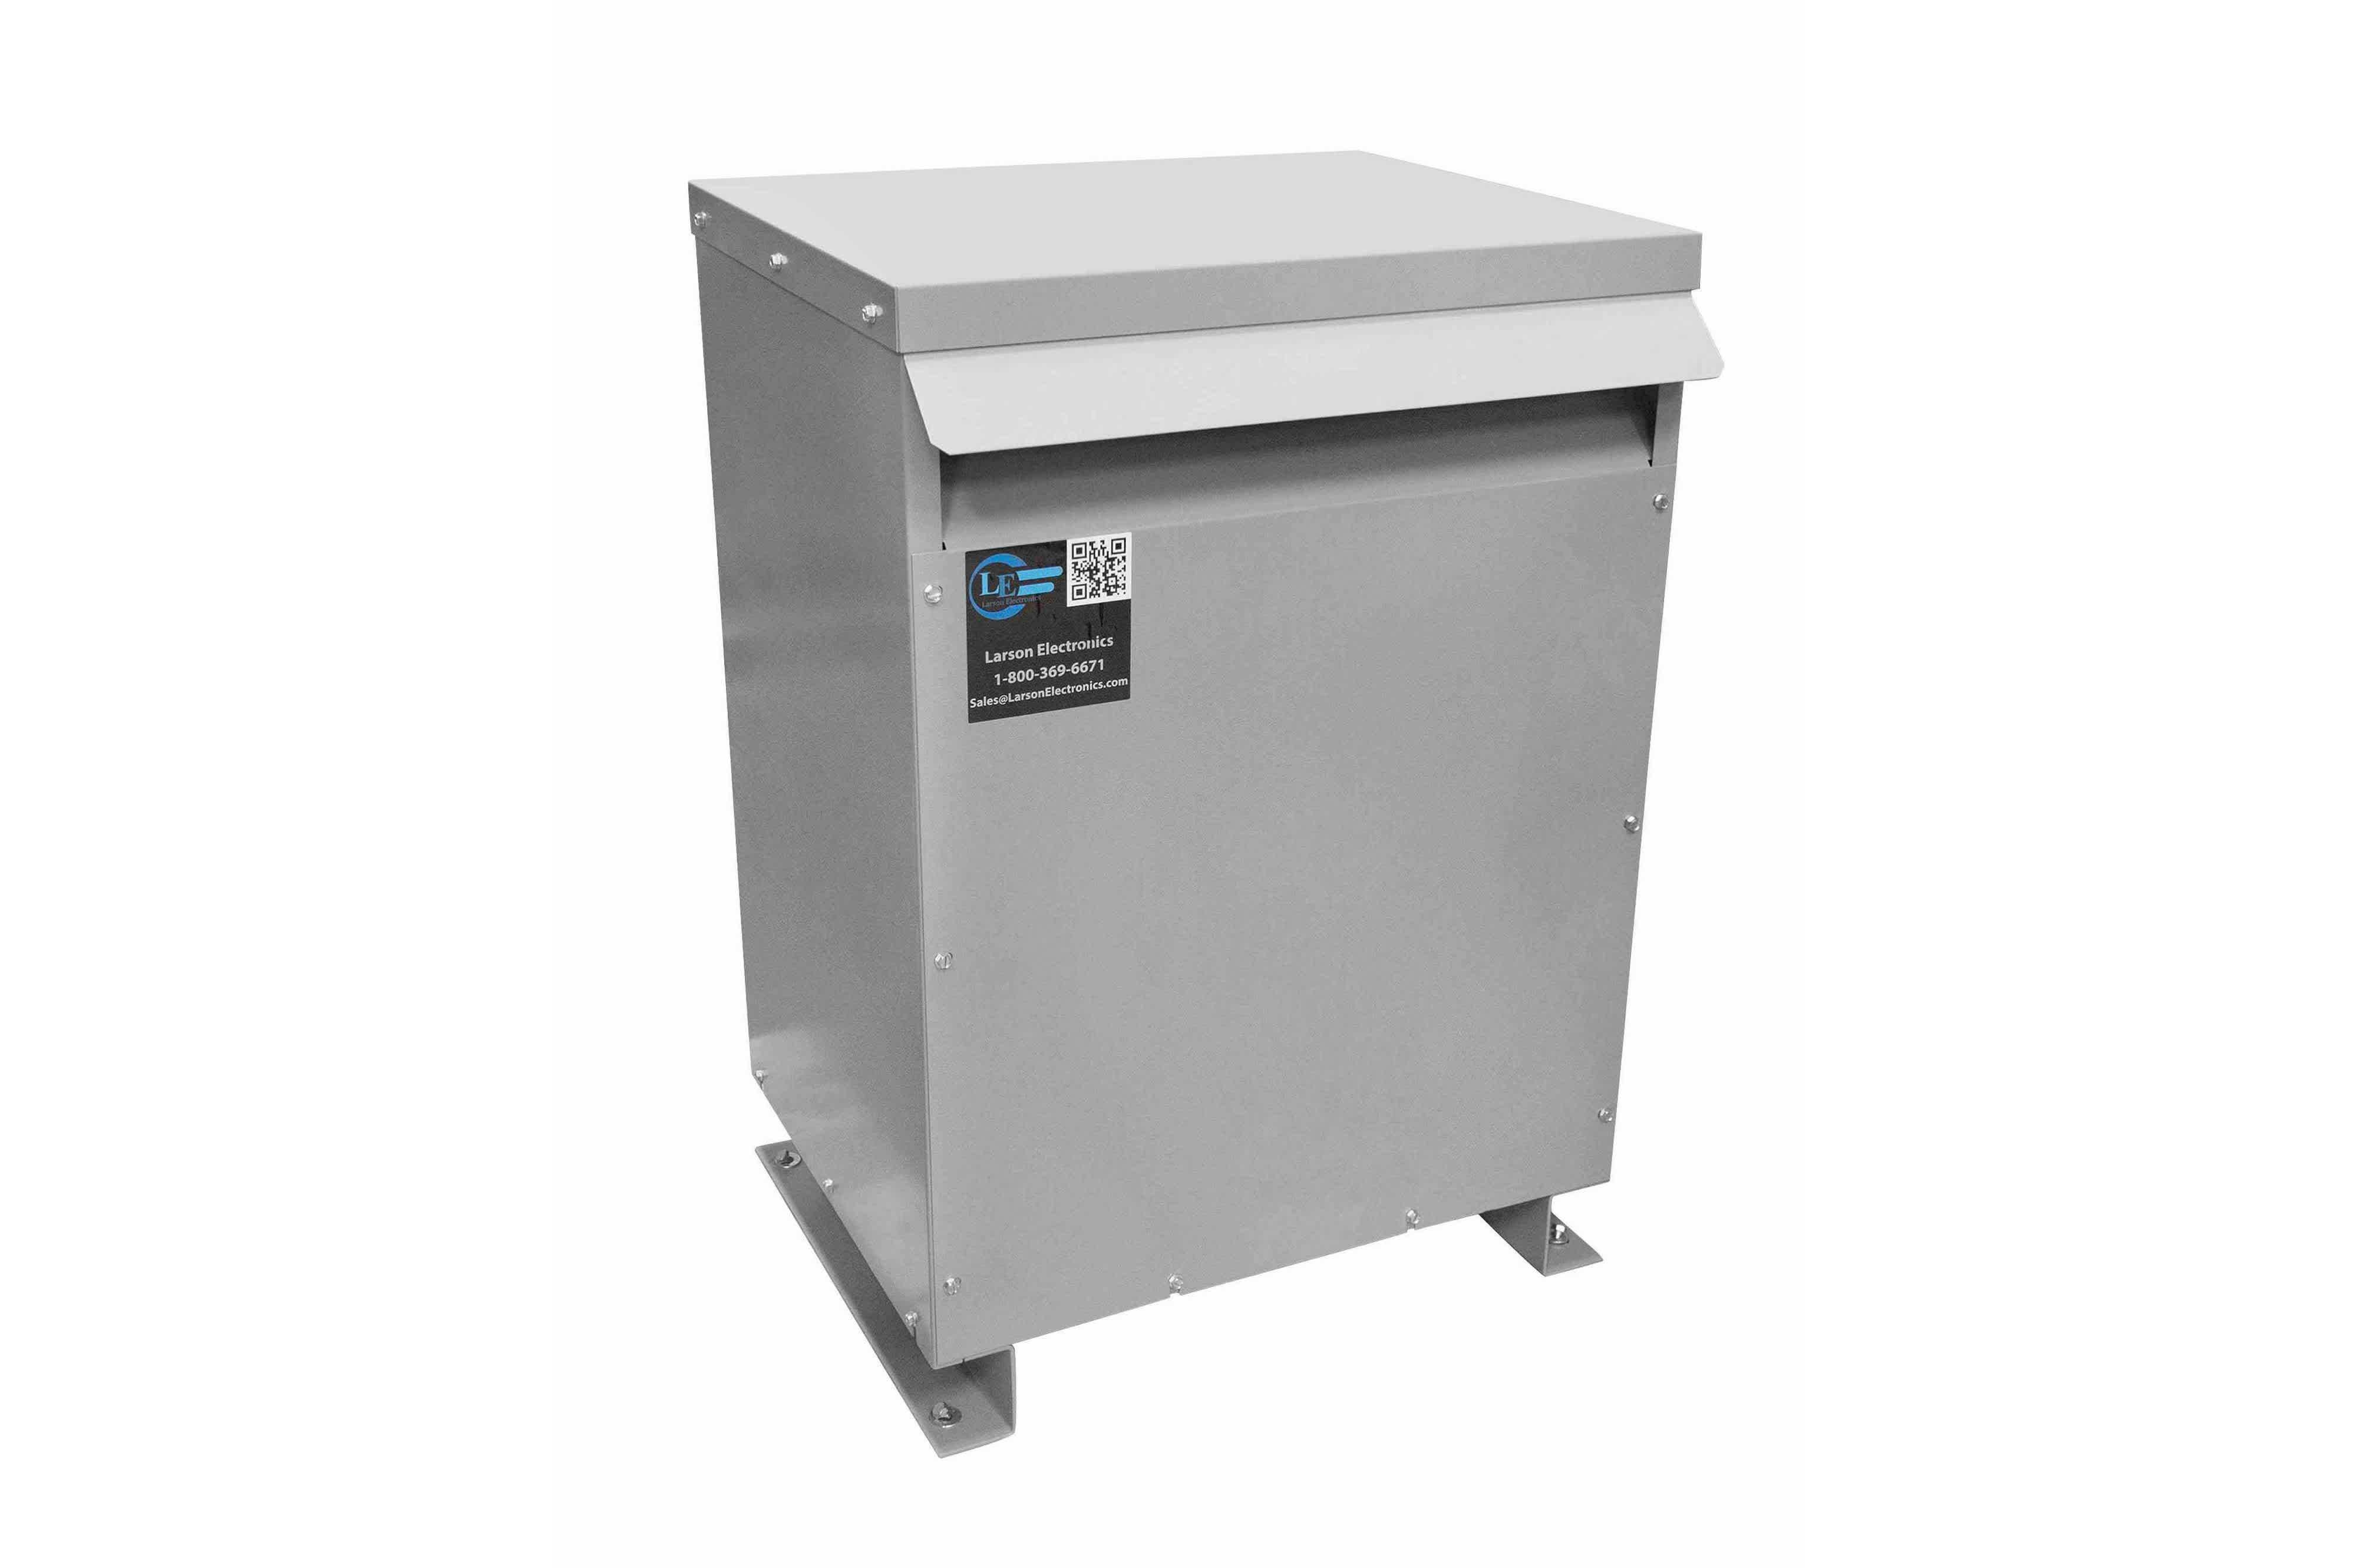 60 kVA 3PH Isolation Transformer, 208V Wye Primary, 415V Delta Secondary, N3R, Ventilated, 60 Hz